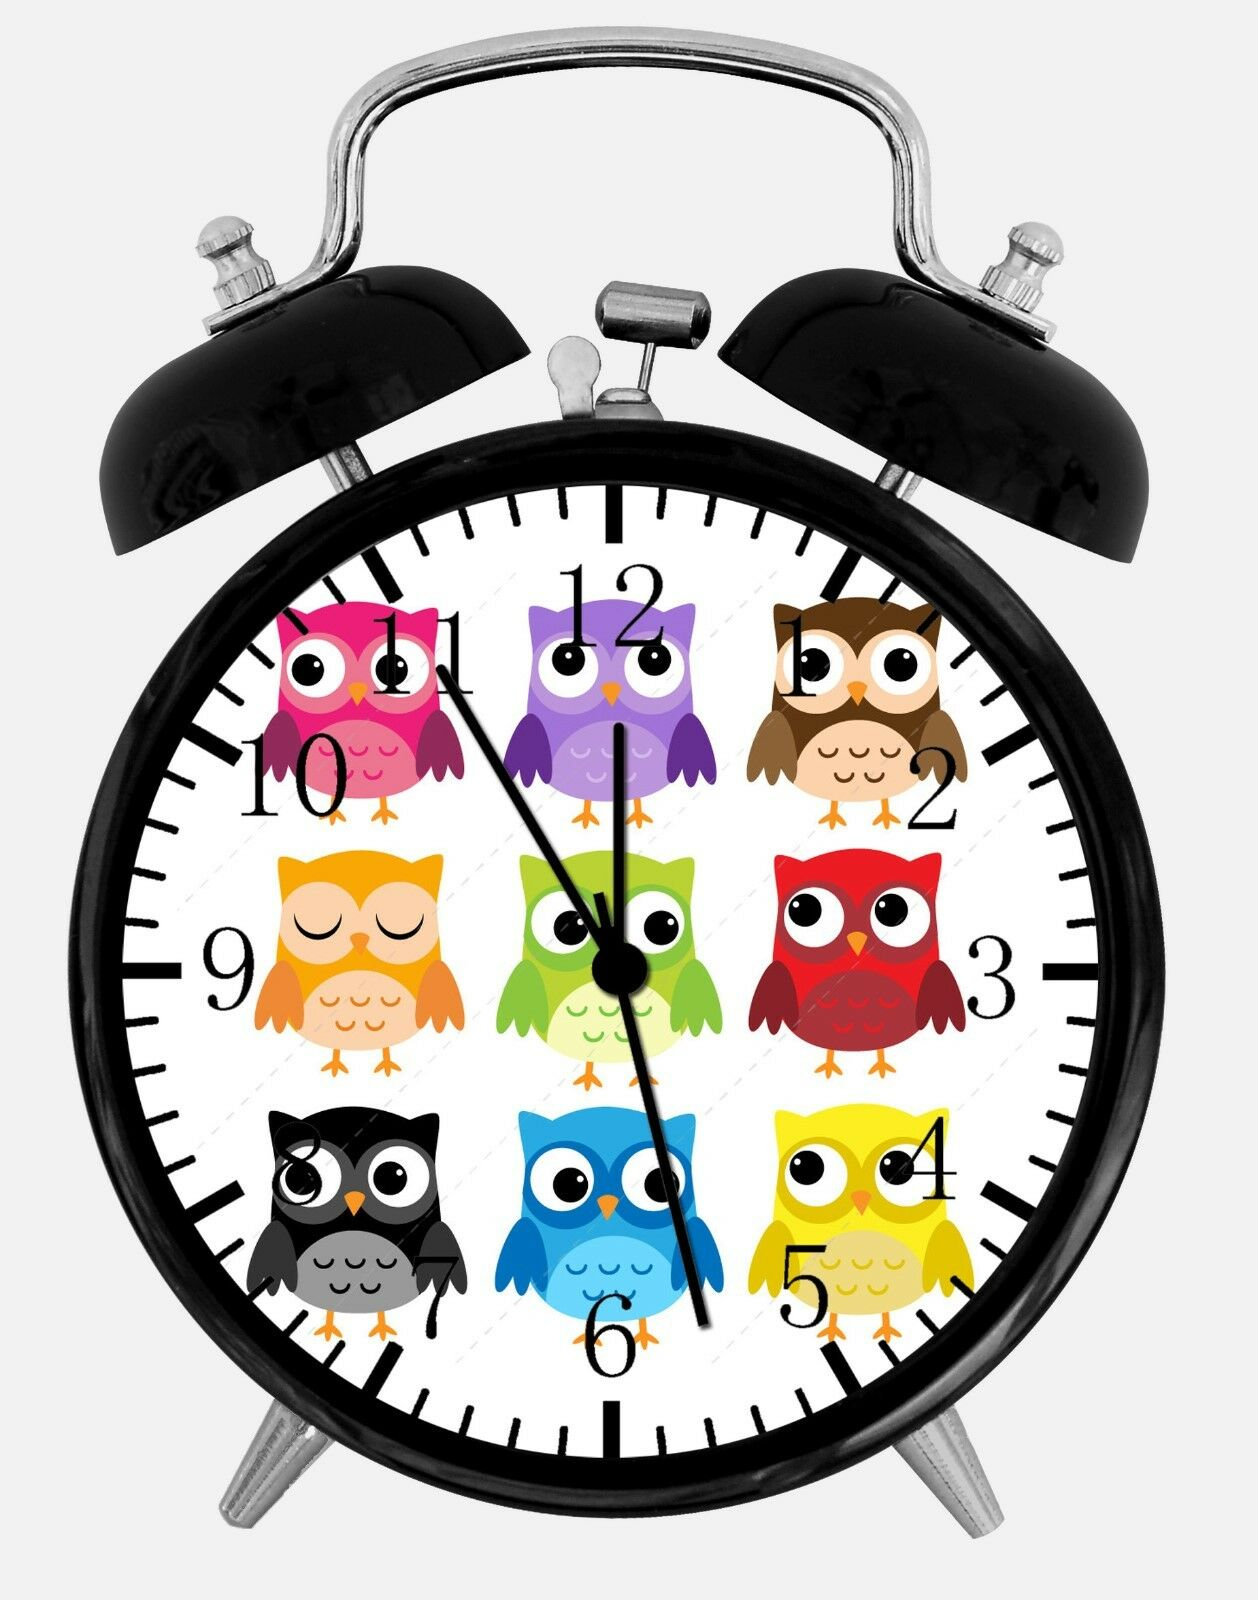 "Cute Owl Alarm Desk Clock 3.75"" Home or Office Decor E297 Nice For Gift"